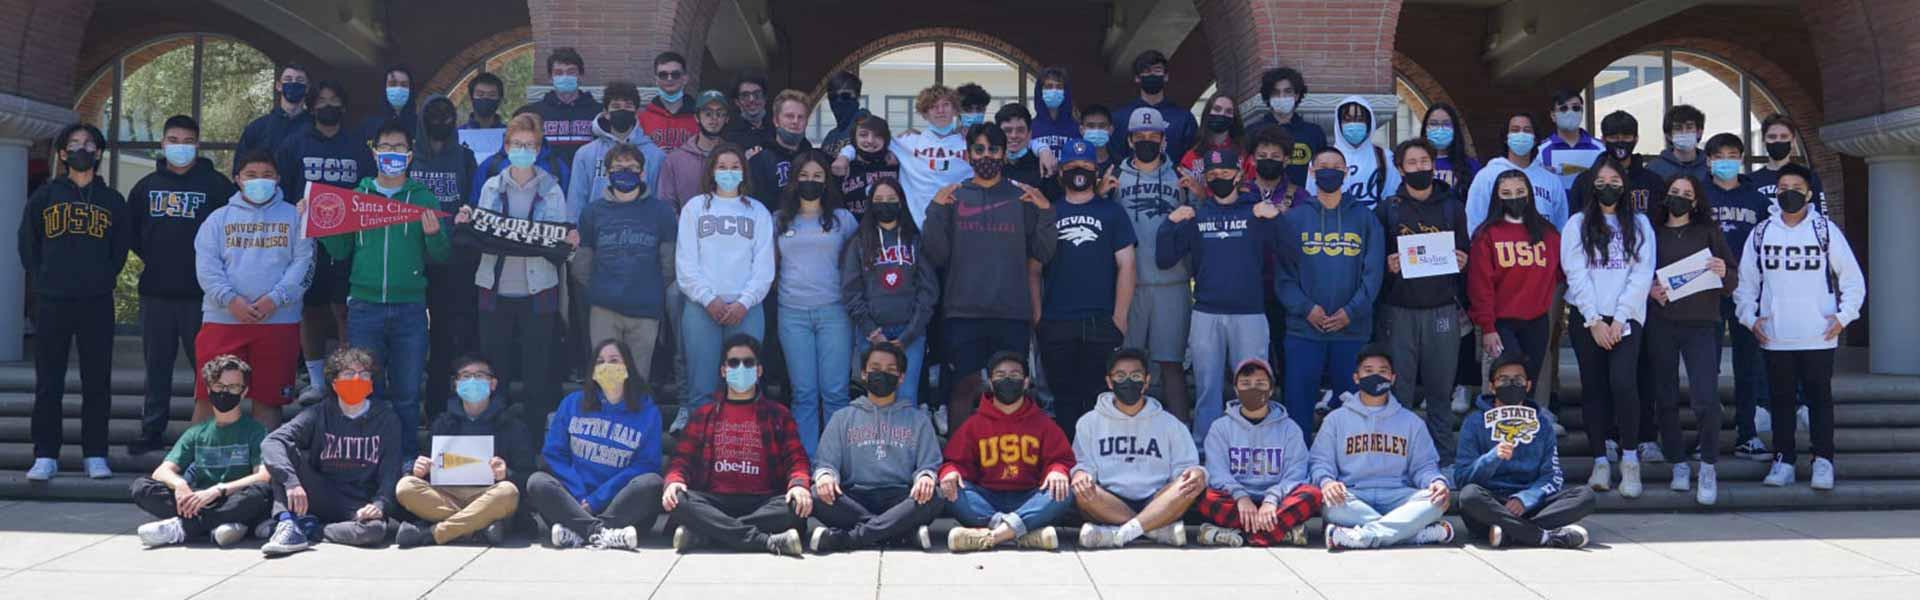 College acceptance sweatshirts Archbishop Riordan High School California